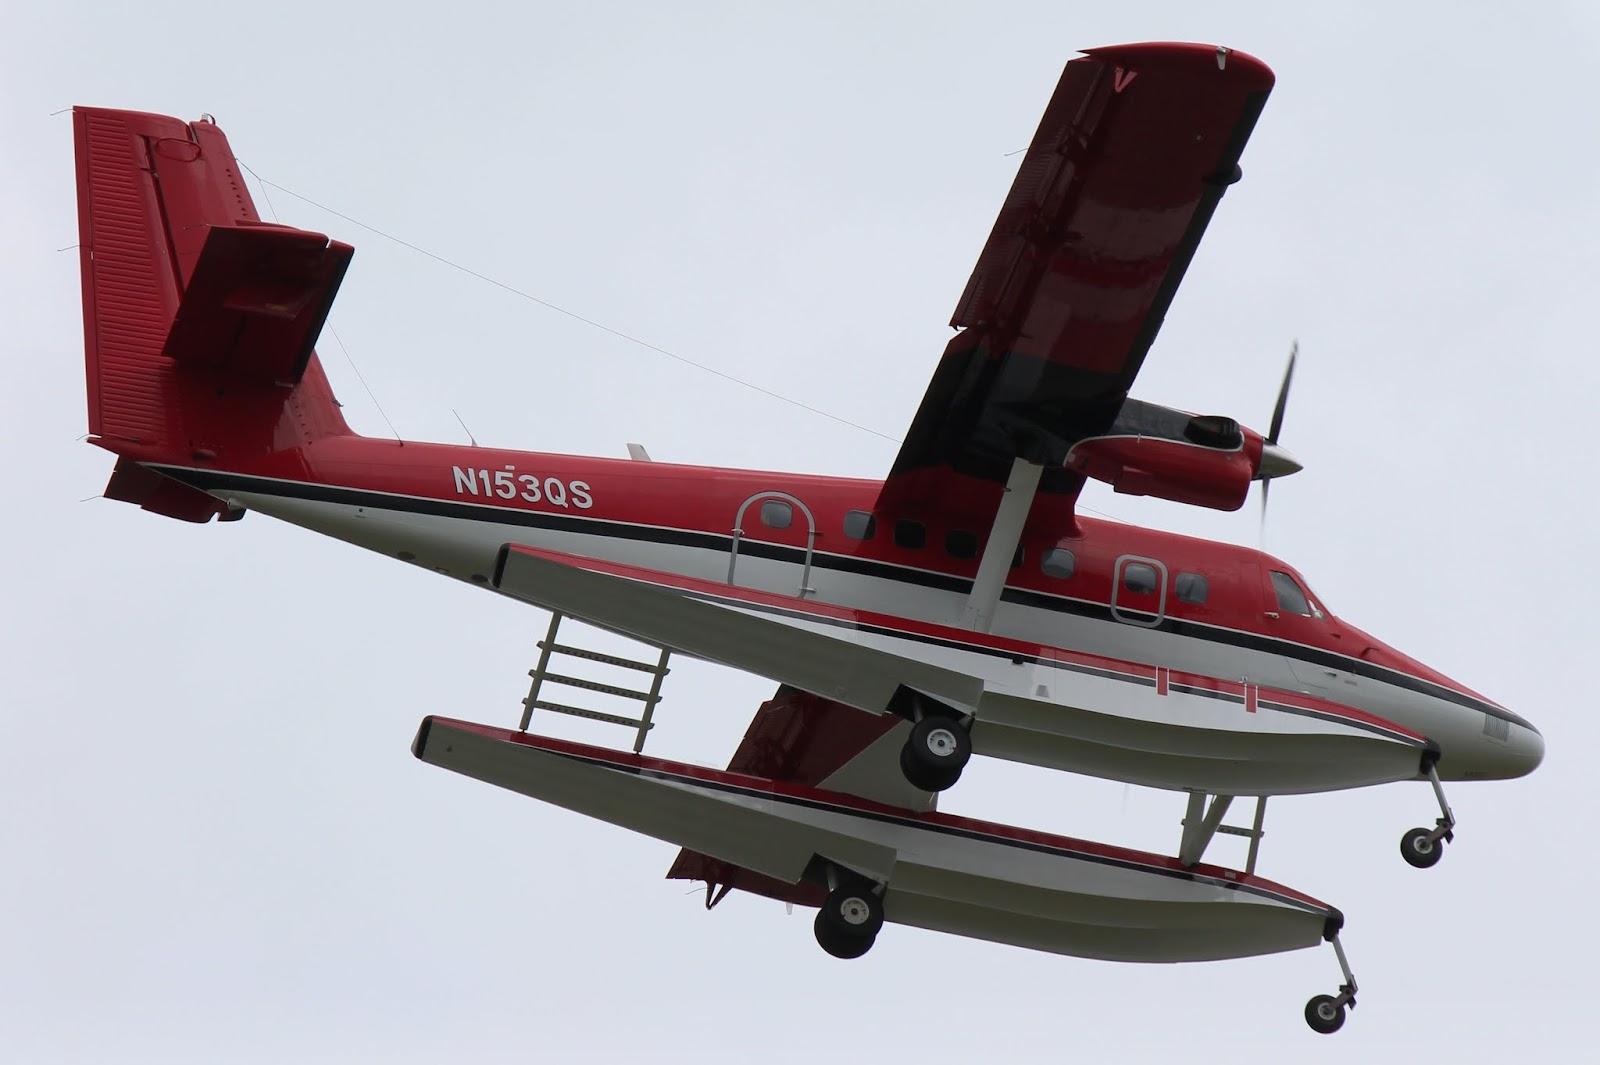 YBCS Plane Spotting: d...